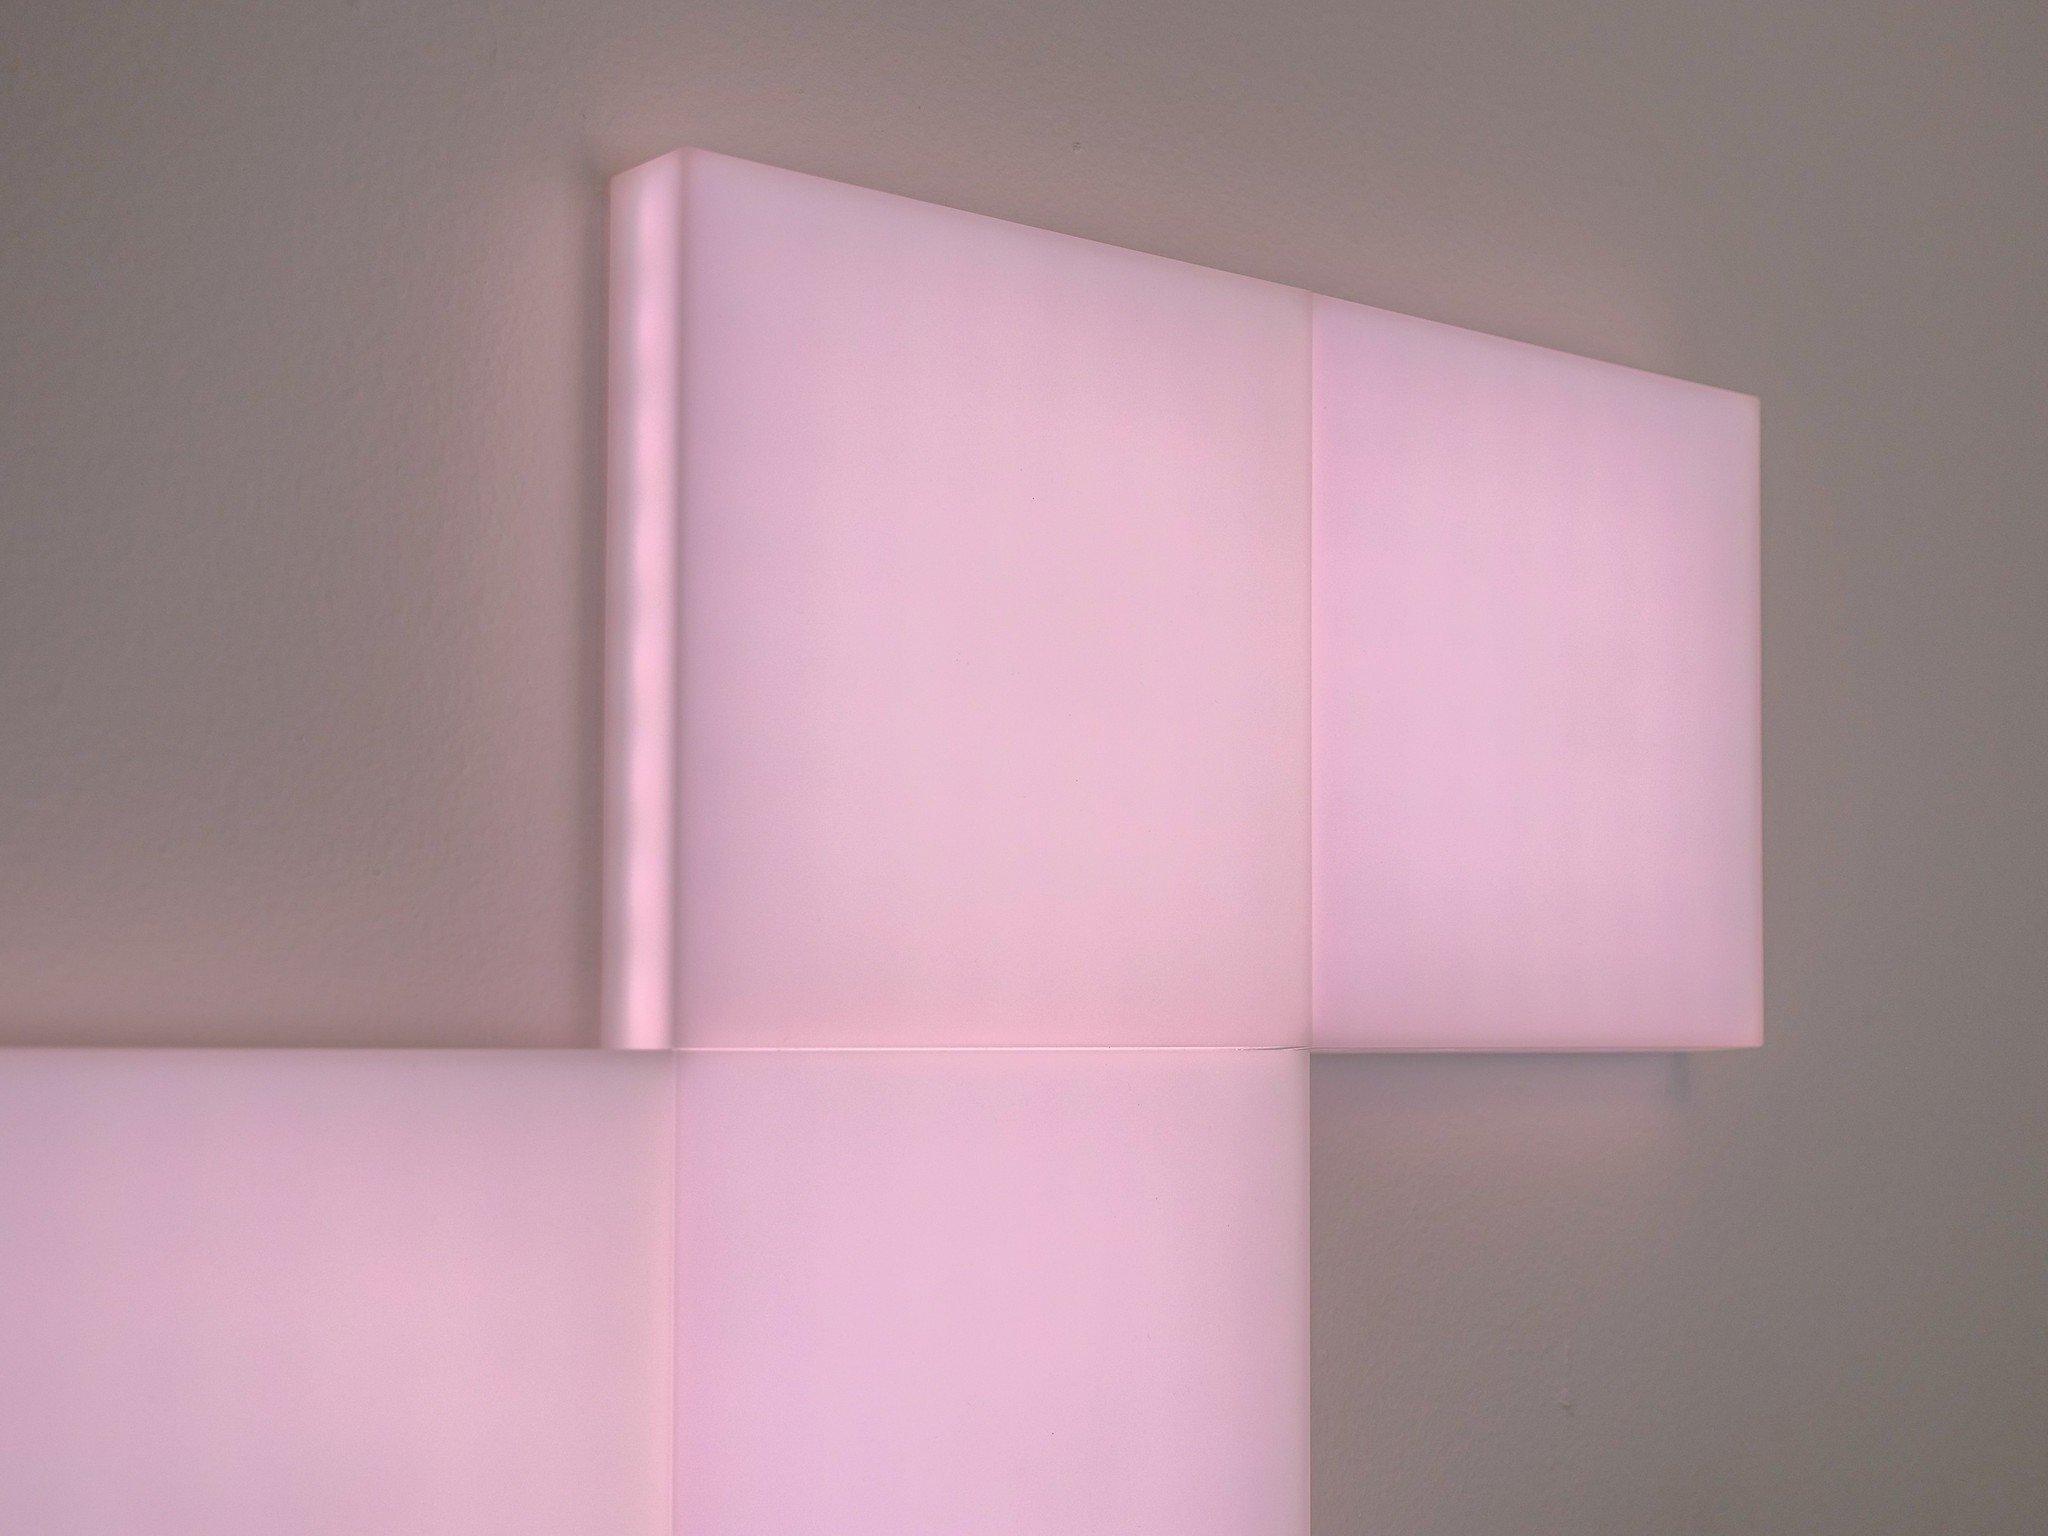 lifx tile review my favorite